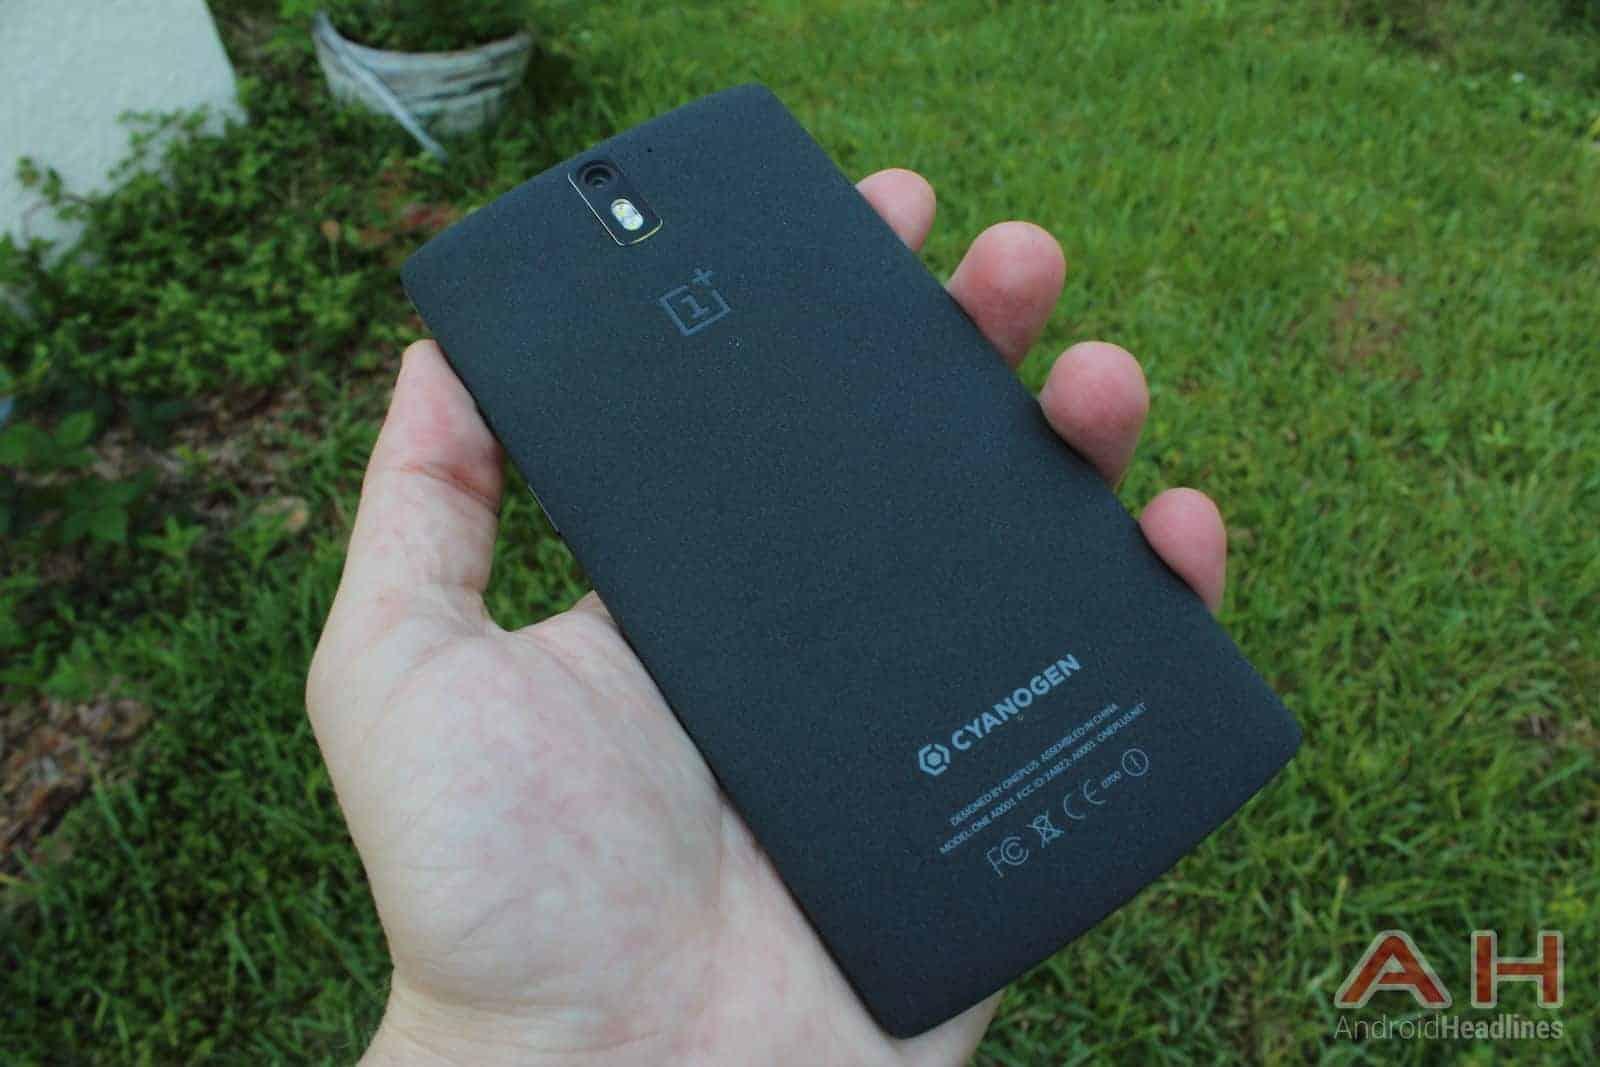 OnePlus One holding back